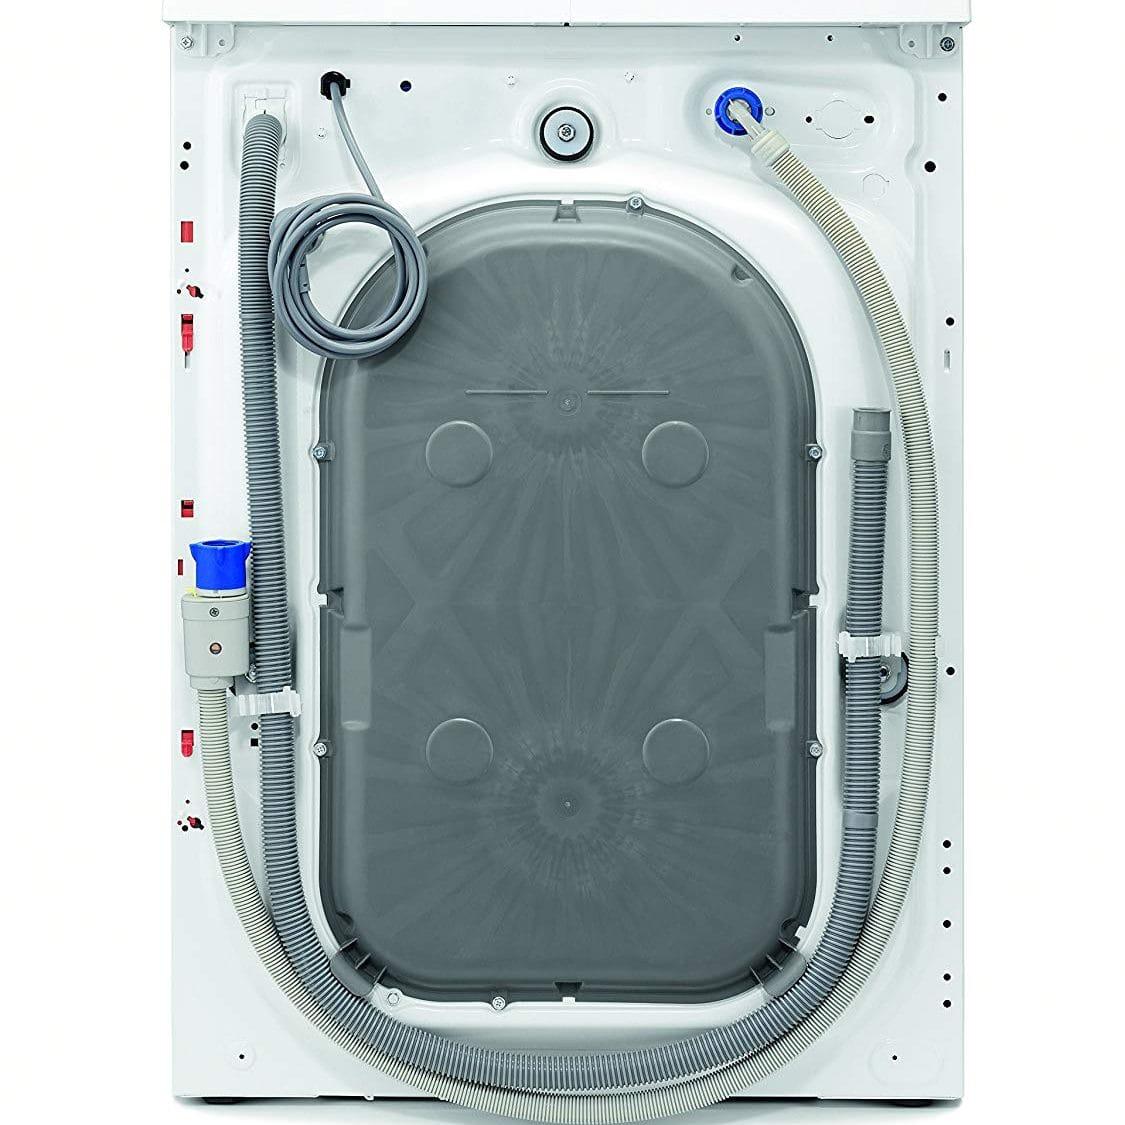 Máy giặt AEG L8FE74485 Waschmaschine Frontlader 1